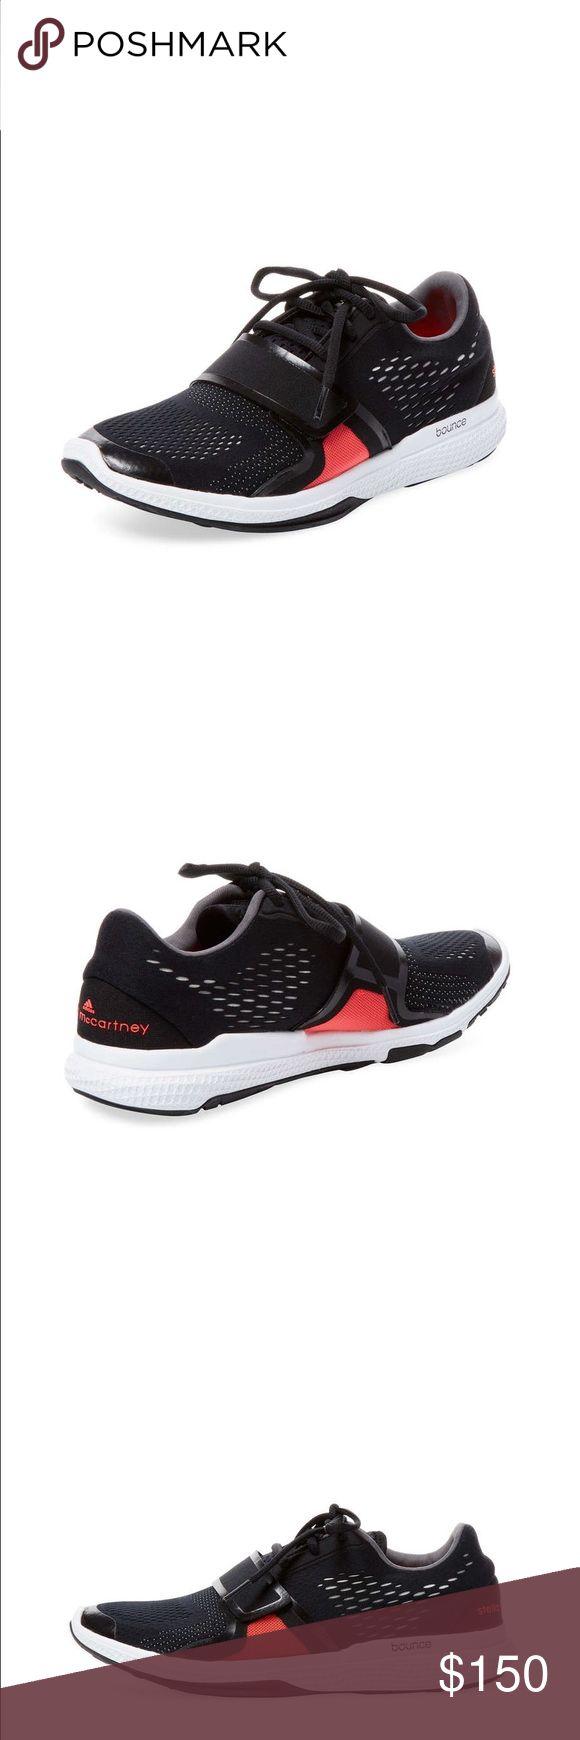 Stella McCartney Running shoes❌sold❌ Running shoes Adidas by Stella McCartney Shoes Sneakers